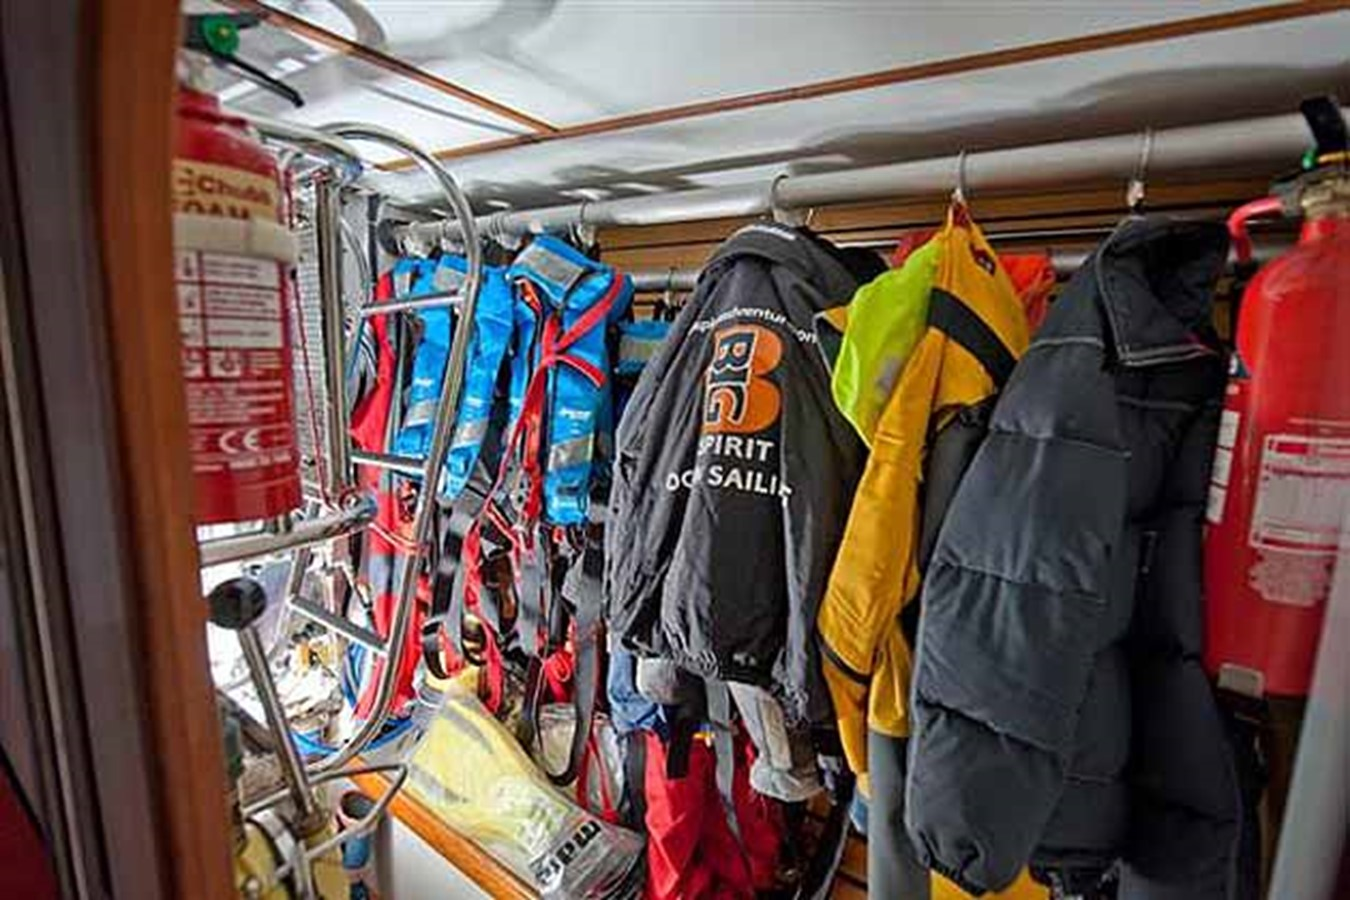 2000 DEVONPORT YACHTS Devonport Challenge 72 Cruising Sailboat 1516096